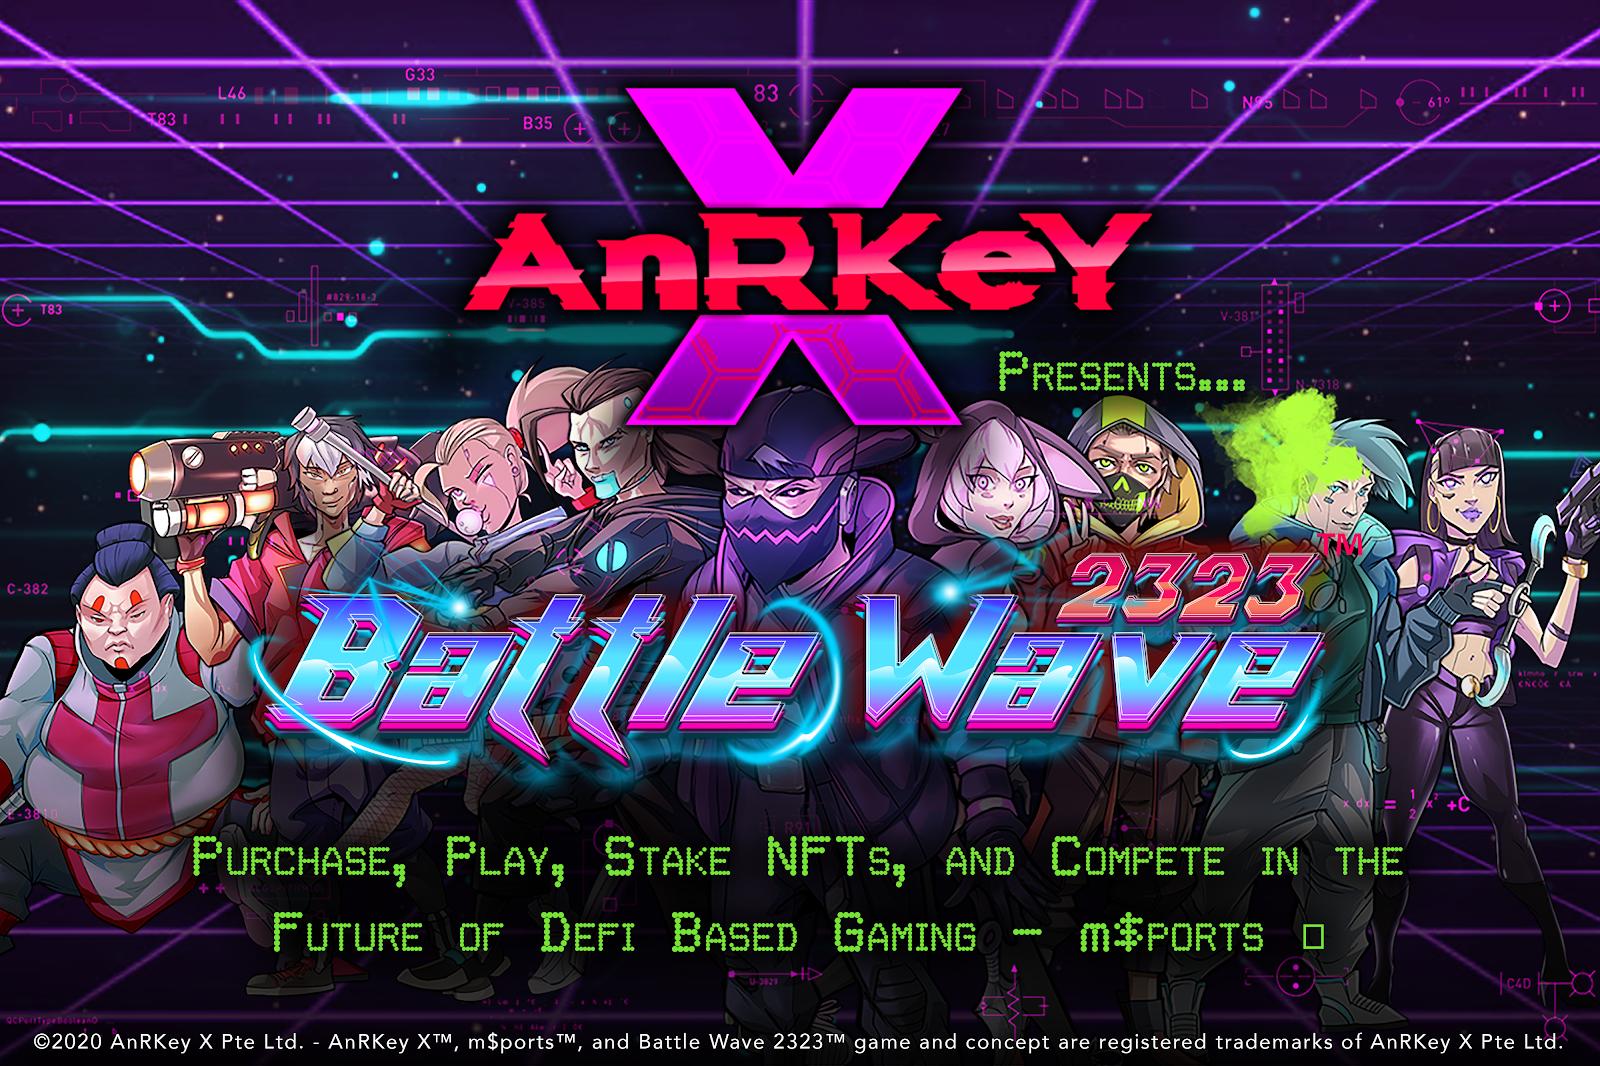 anrkey_x_presents_battle_wave_2323-2x.png